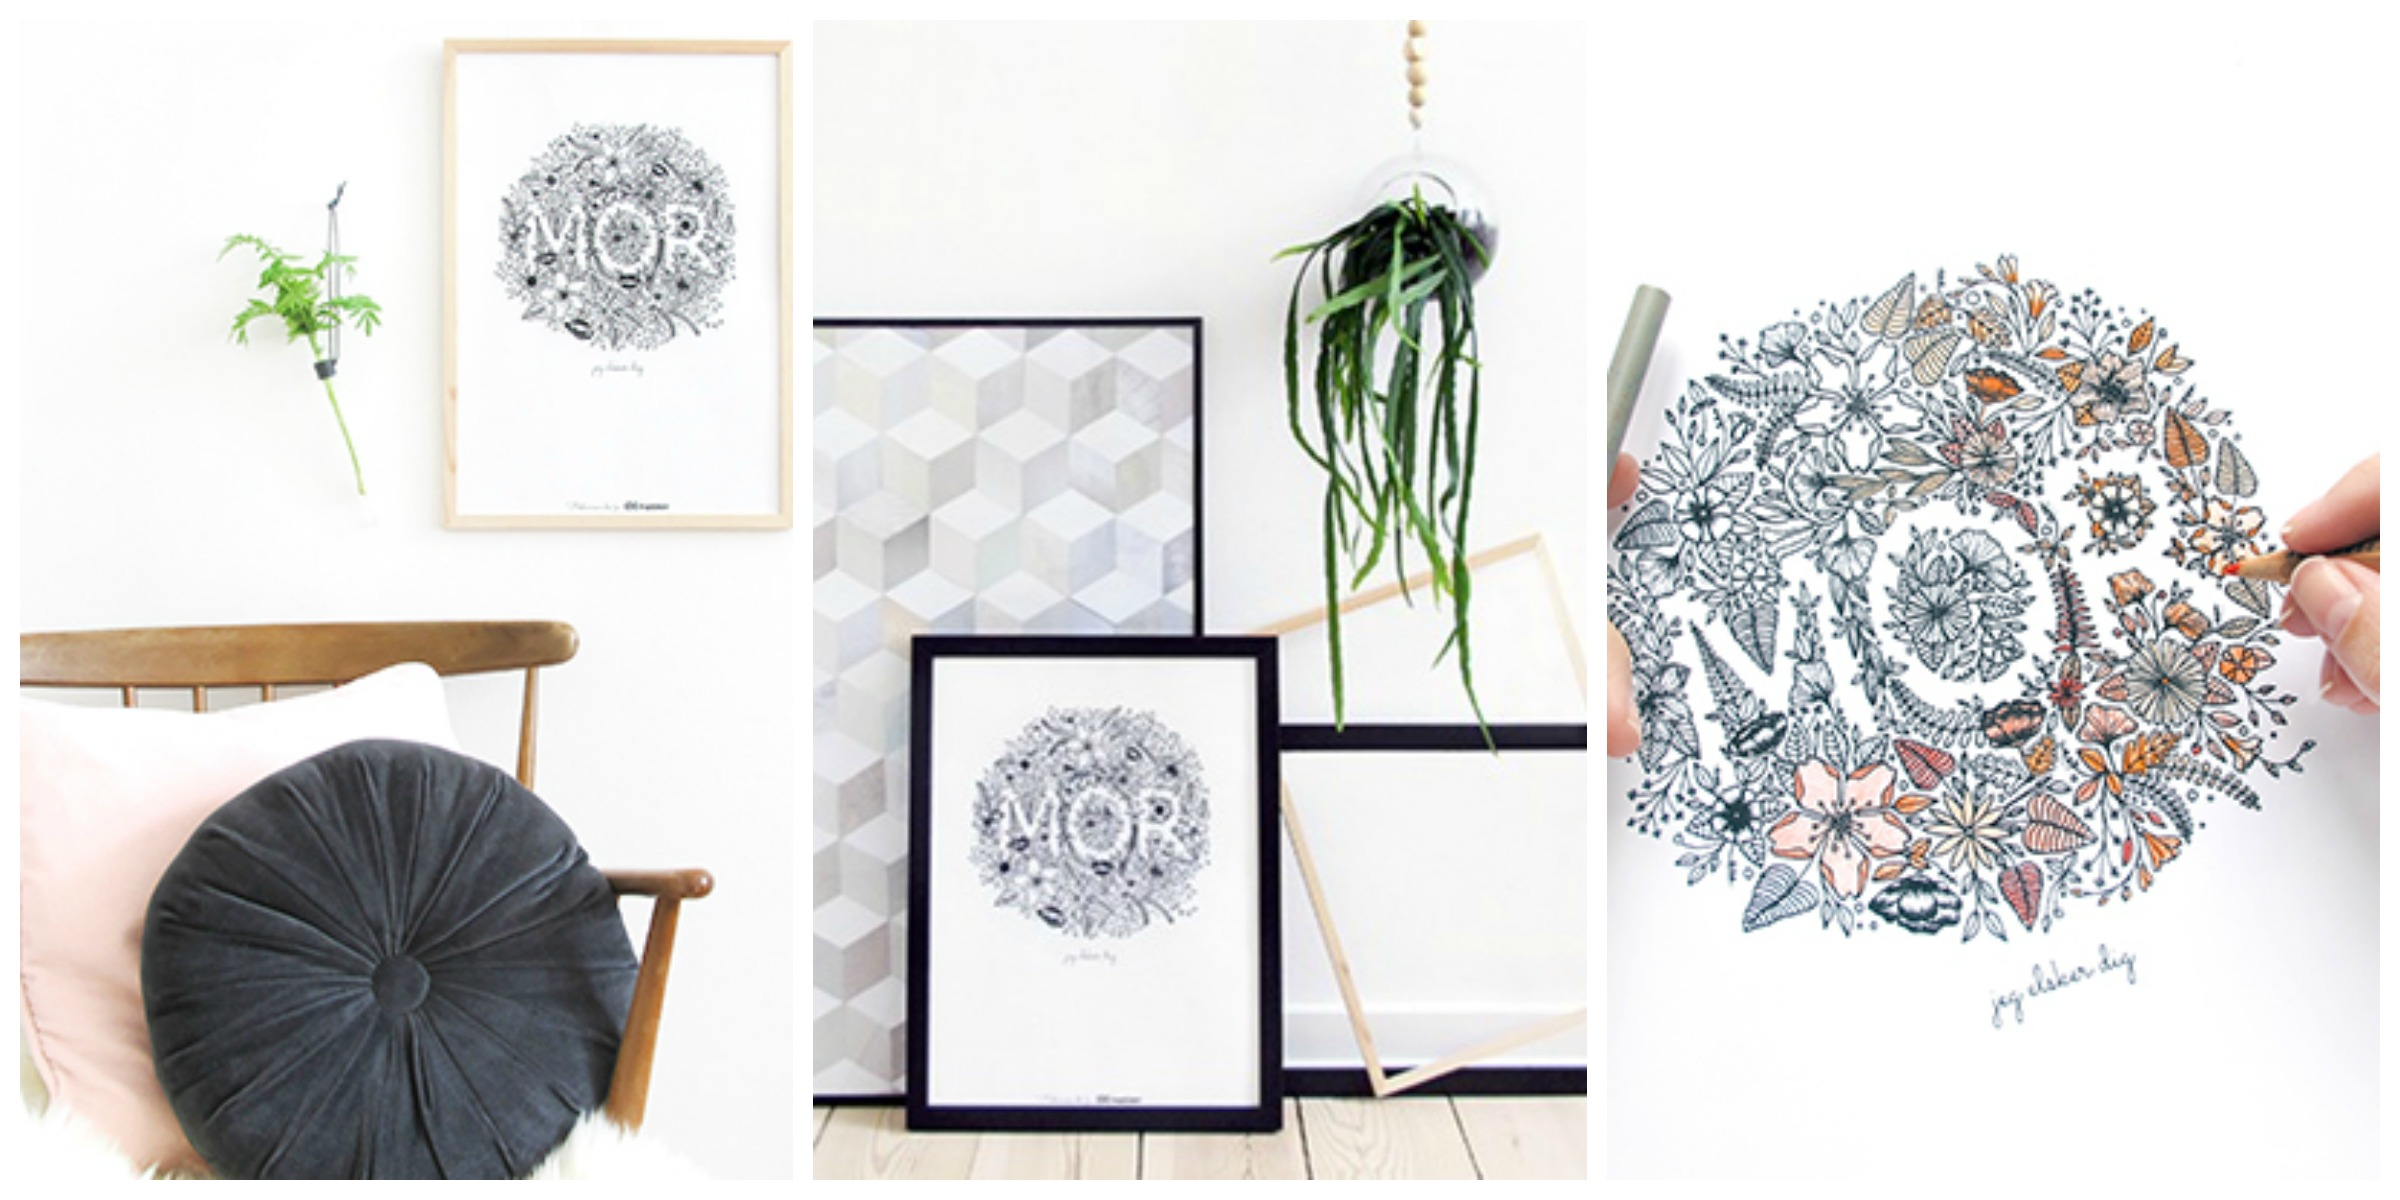 Mors day print idemøbler